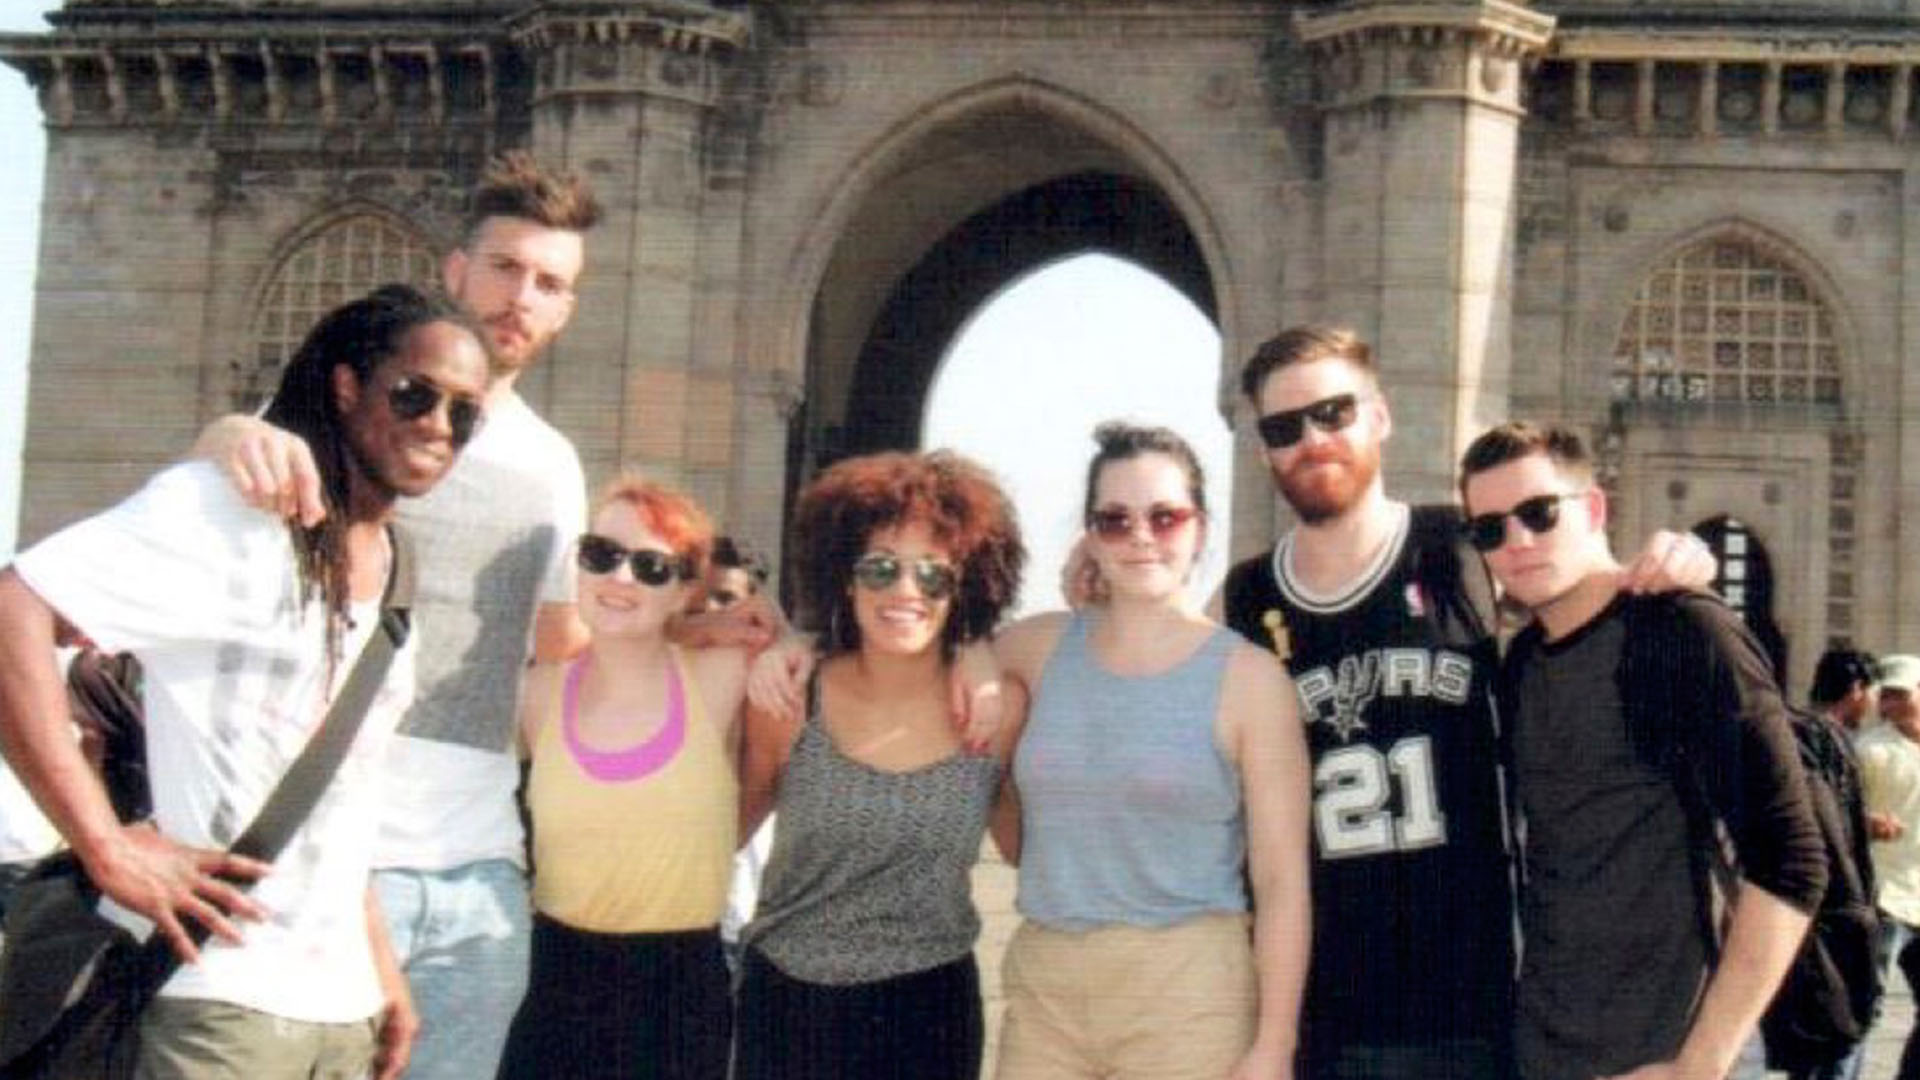 Stomp Cast members on a day off in Mumbai. Nigel Clarke, Dominik Schad, Rhona Ashwood, Louise Durand, Emma King, Simon Watts, Shae Carroll.